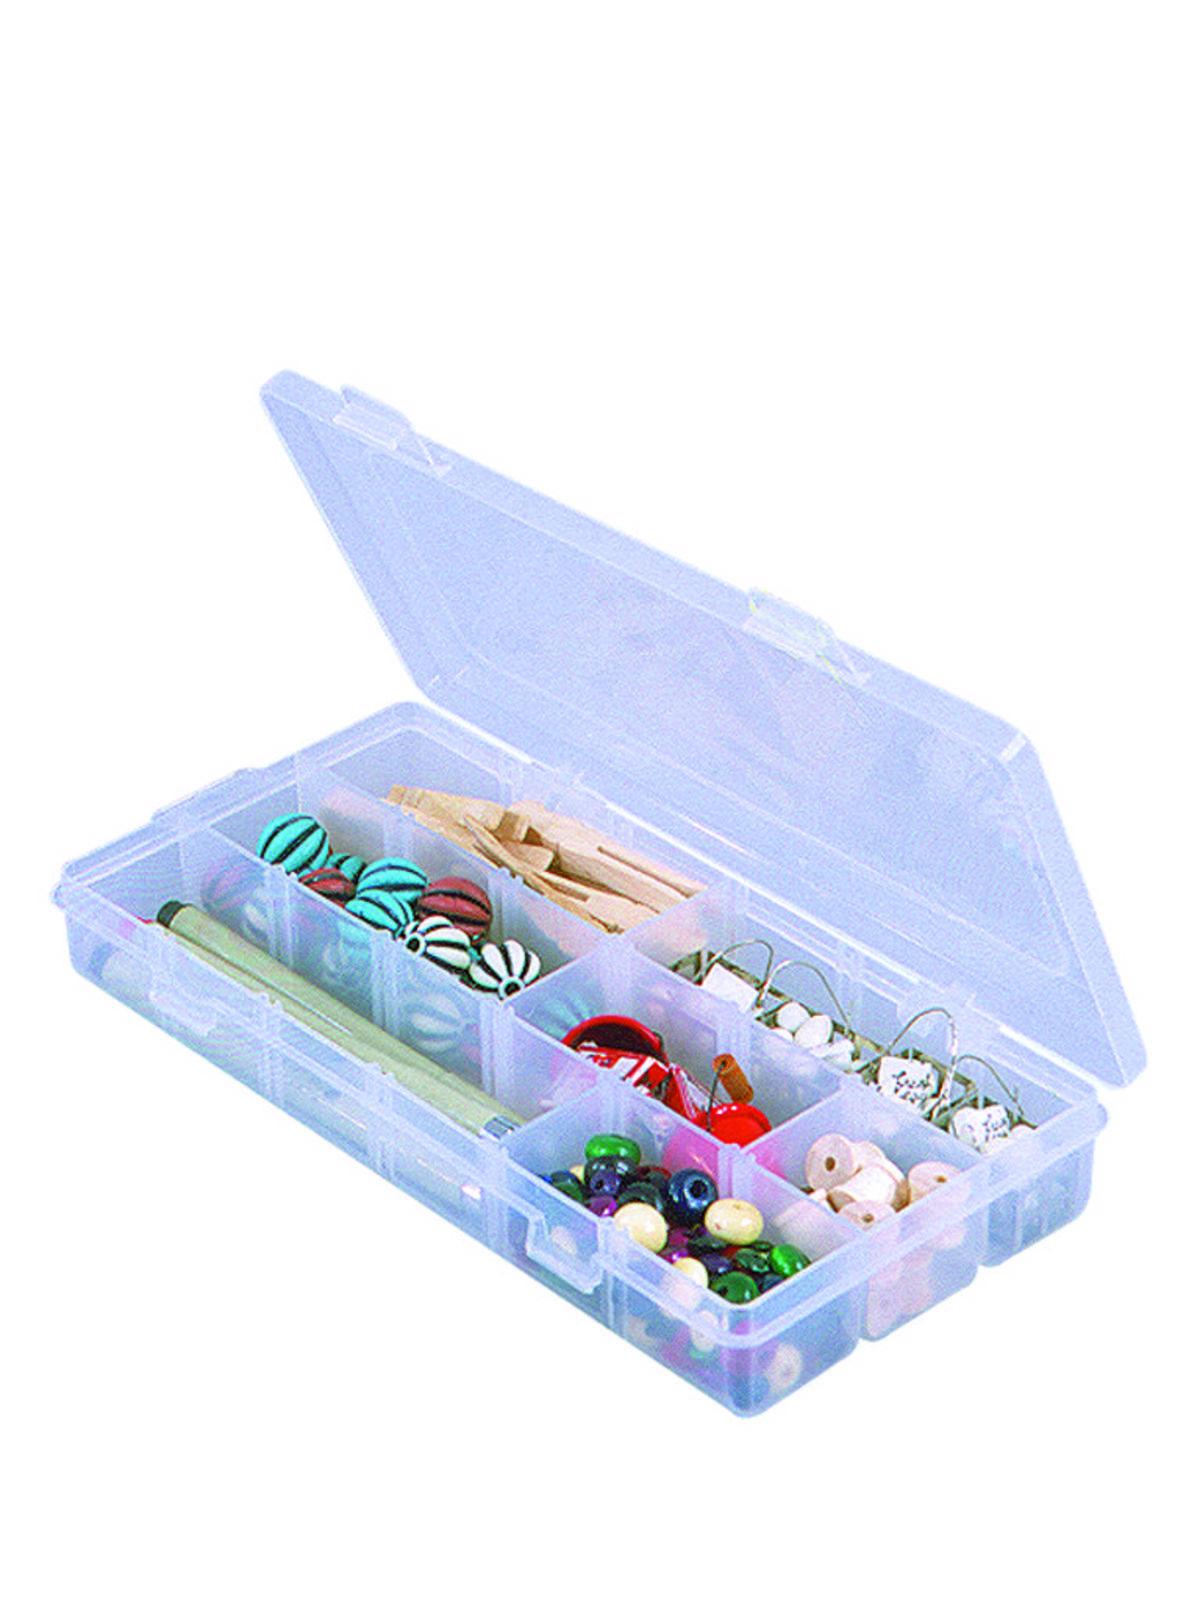 Storcraft Box Storage Box